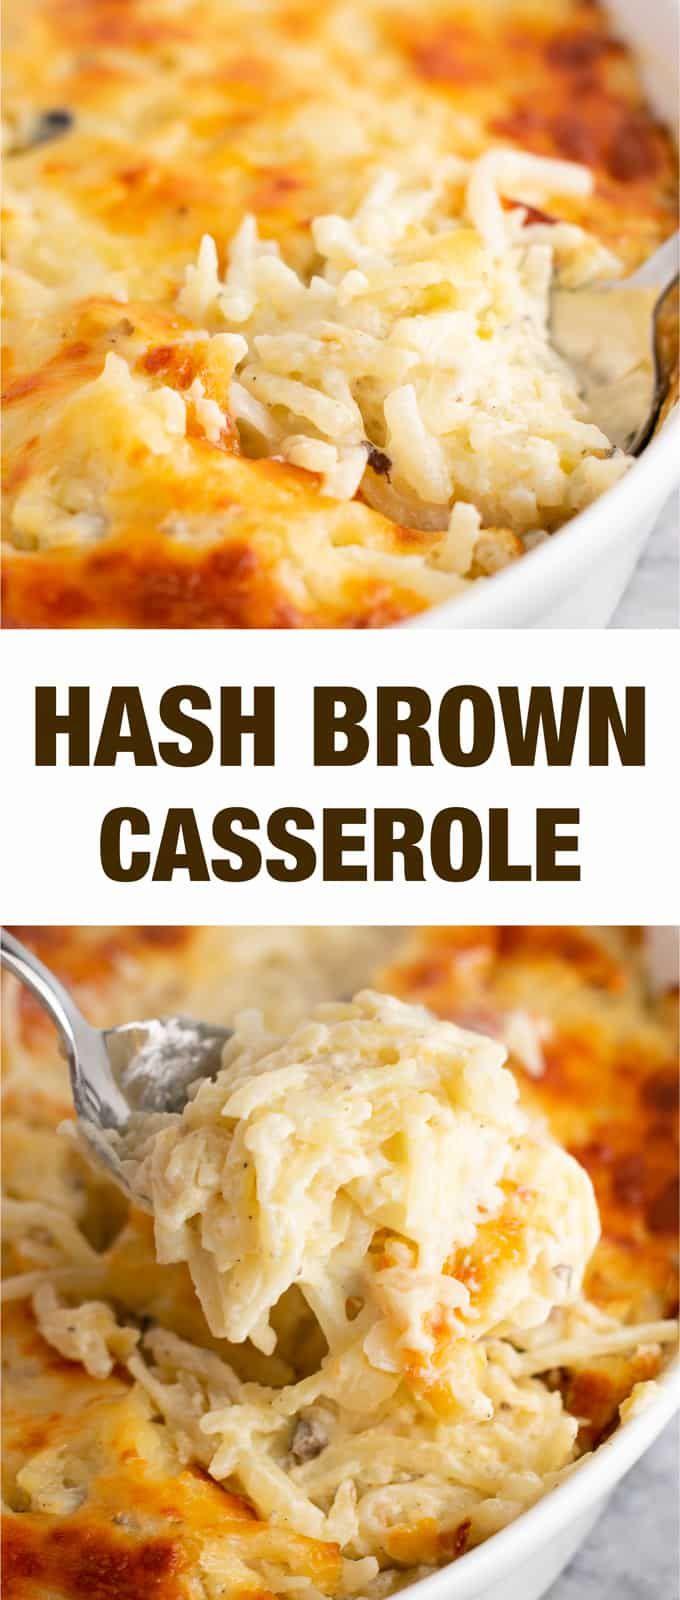 Vegetarian Hash Brown Casserole Recipe The Ultimate Comfort Food Breakfast Vegetarian Breakfast Casserole Breakfast Recipes Casserole Hash Brown Casserole